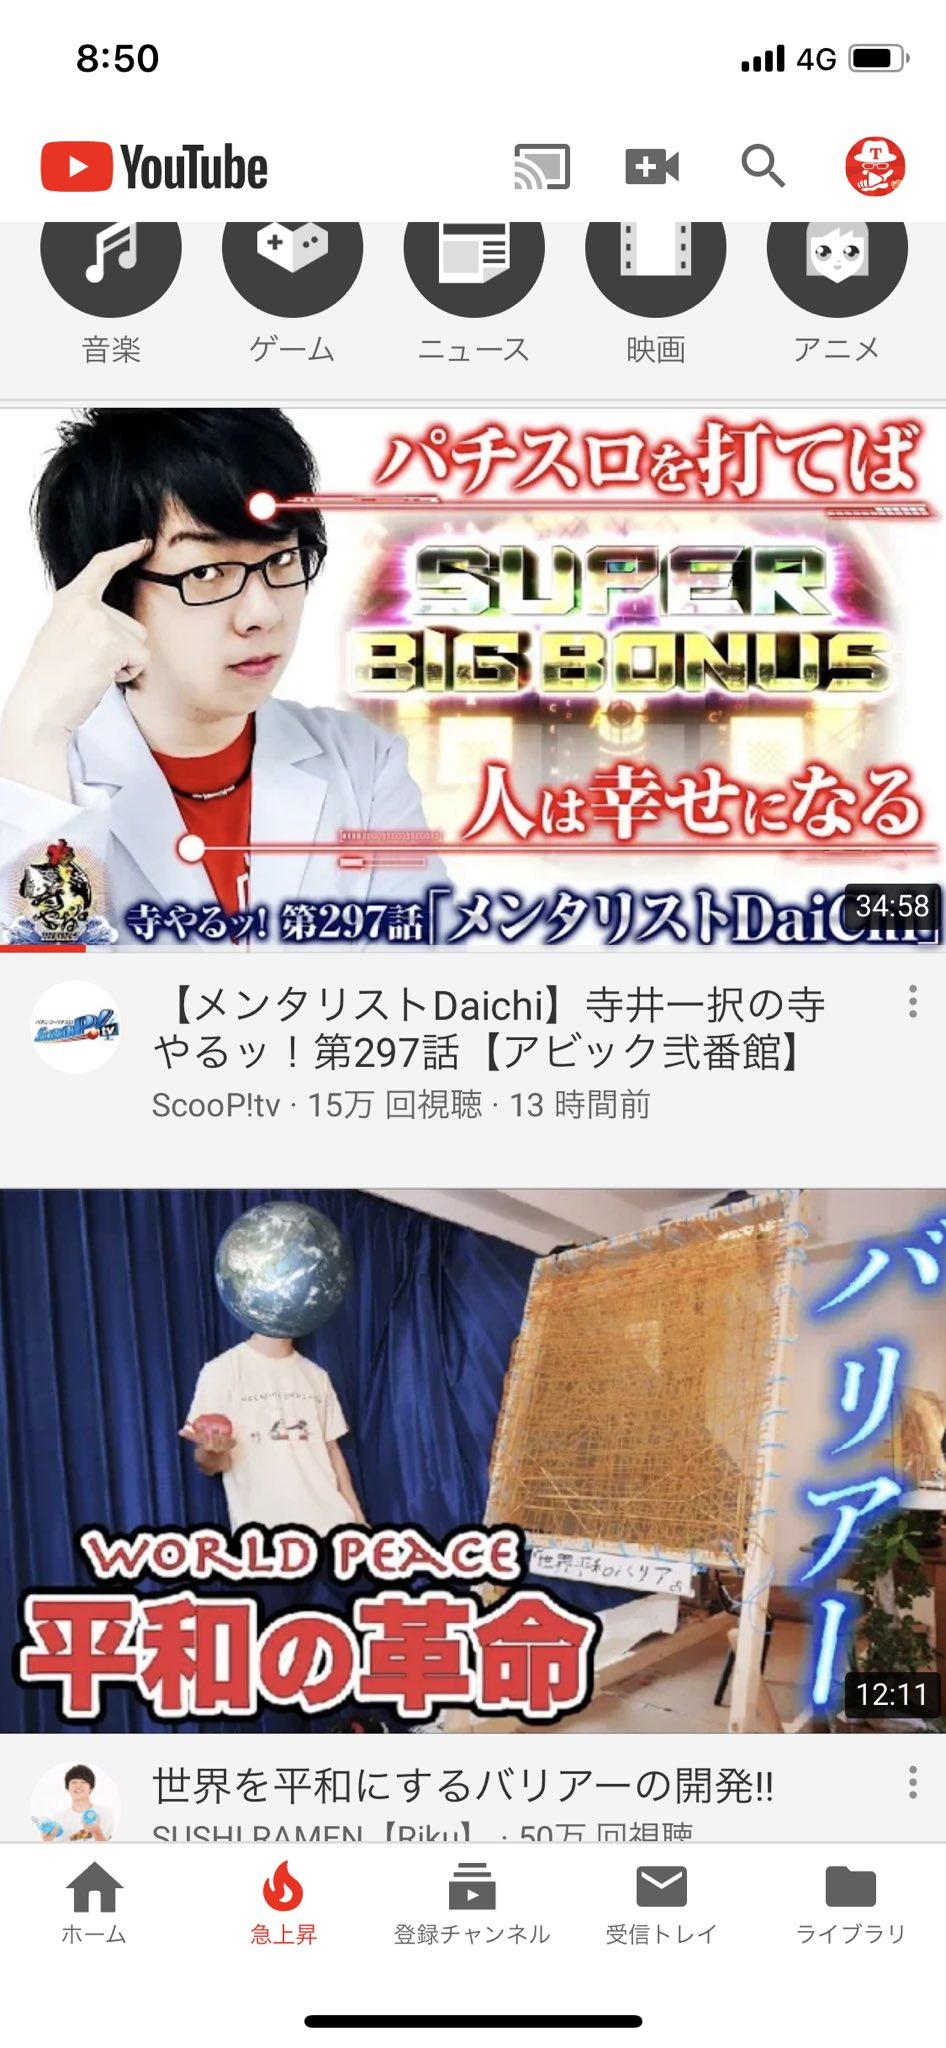 Youtube 寺井一択